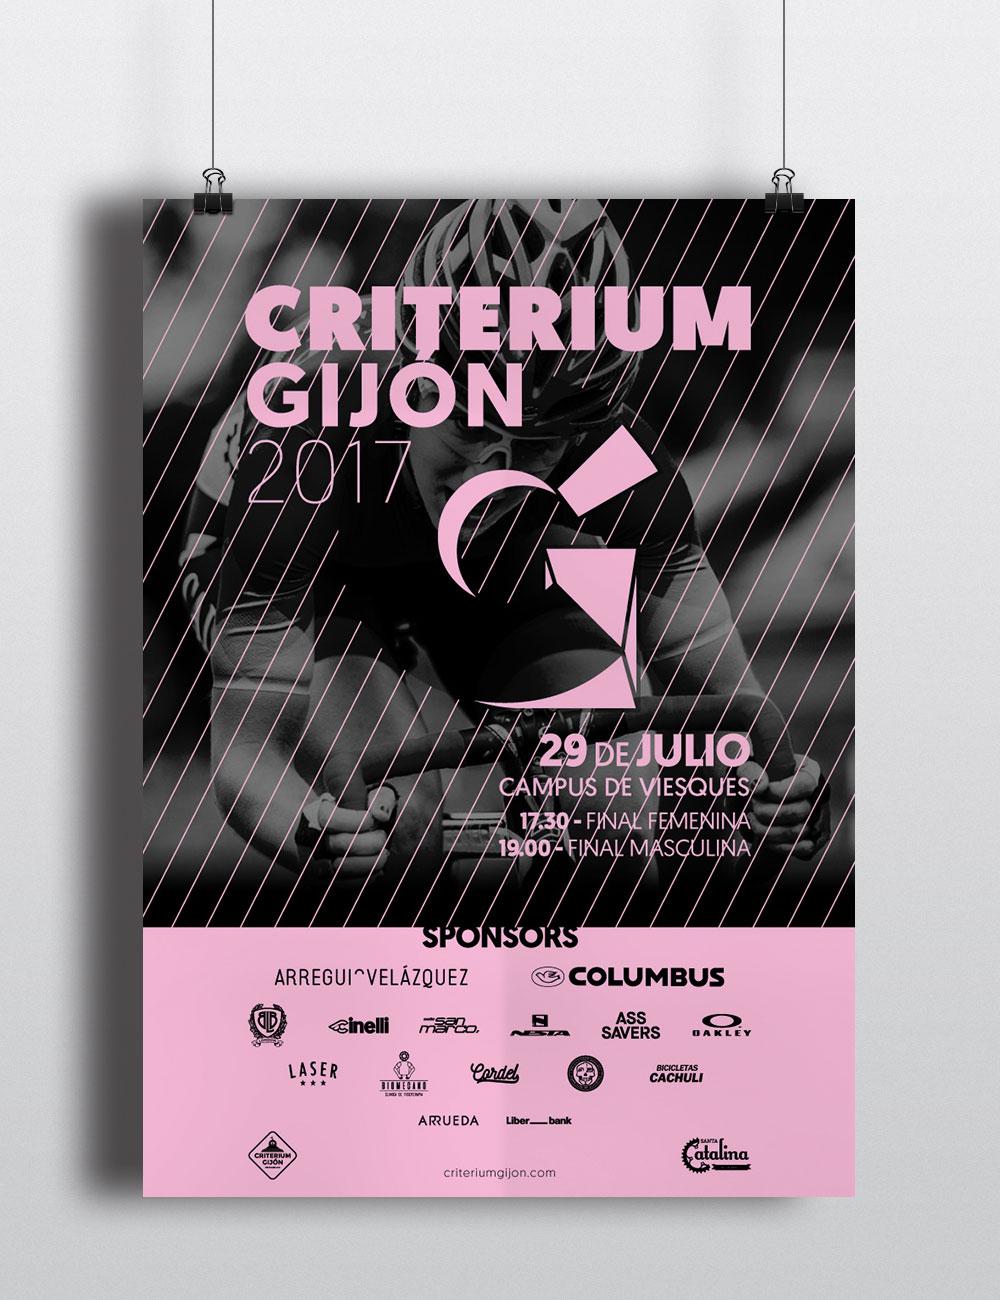 https://robertotunon.com/wp-content/uploads/2017/05/robertotunon-criteriumgijon2017_poster.jpgCriterium Gijón 2017